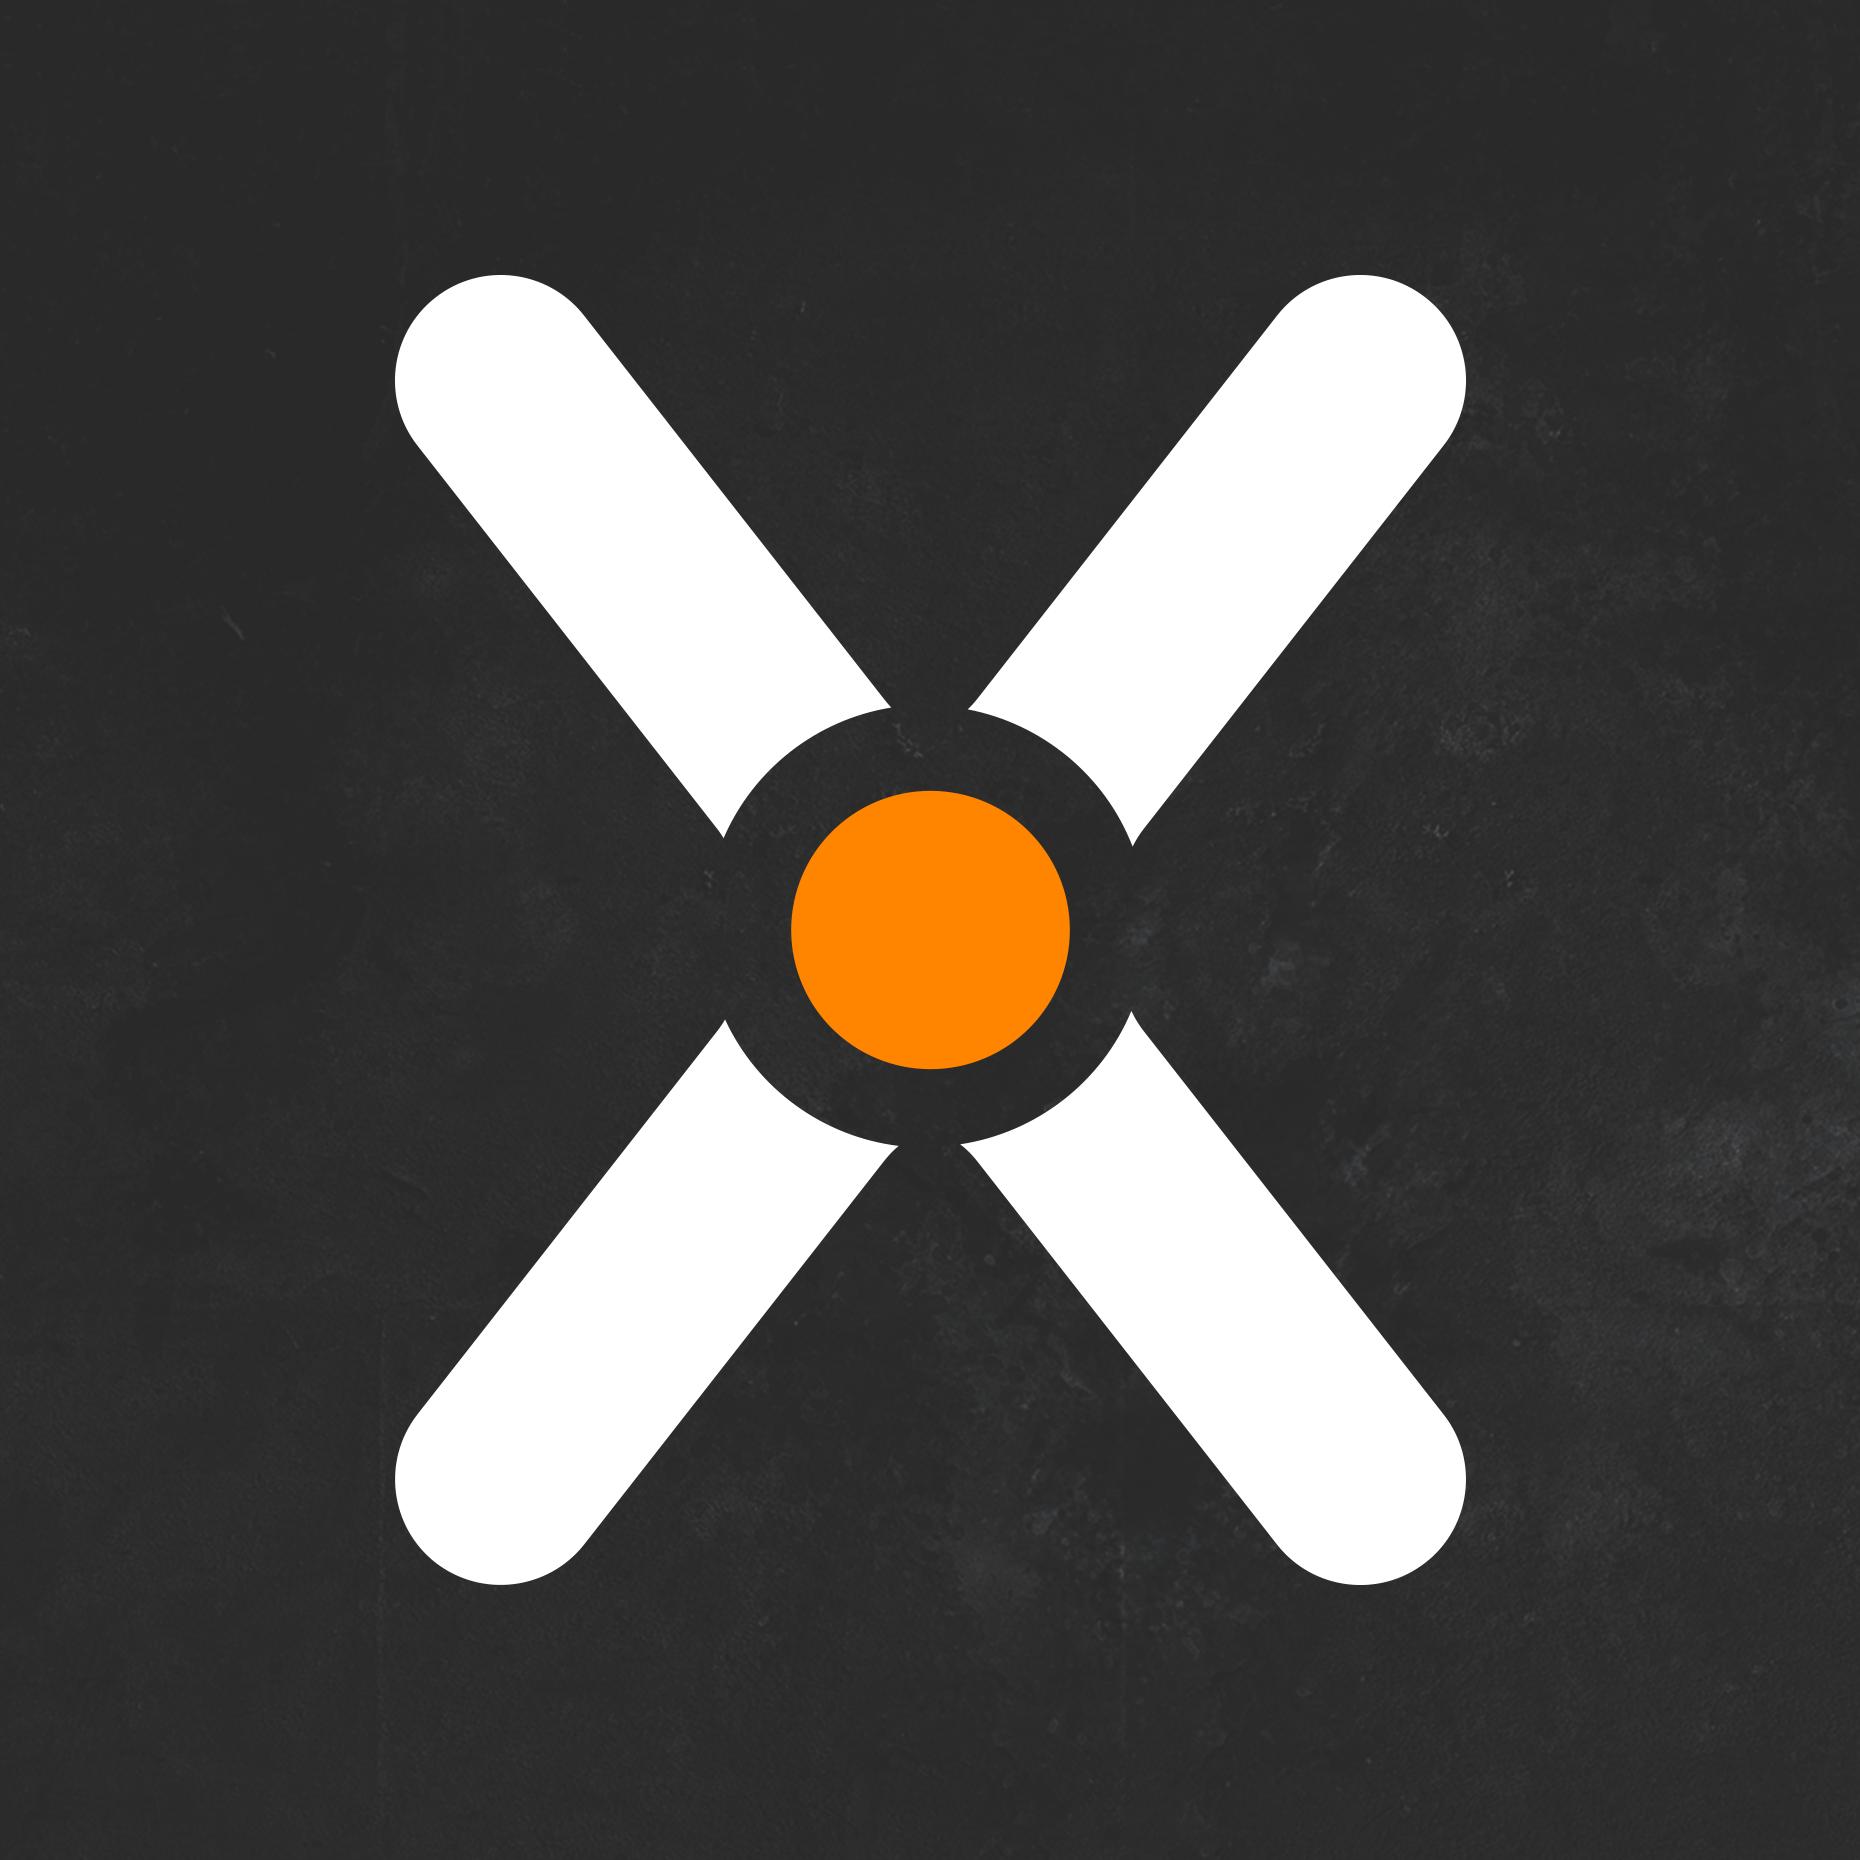 focal X  |  فوكال اكس